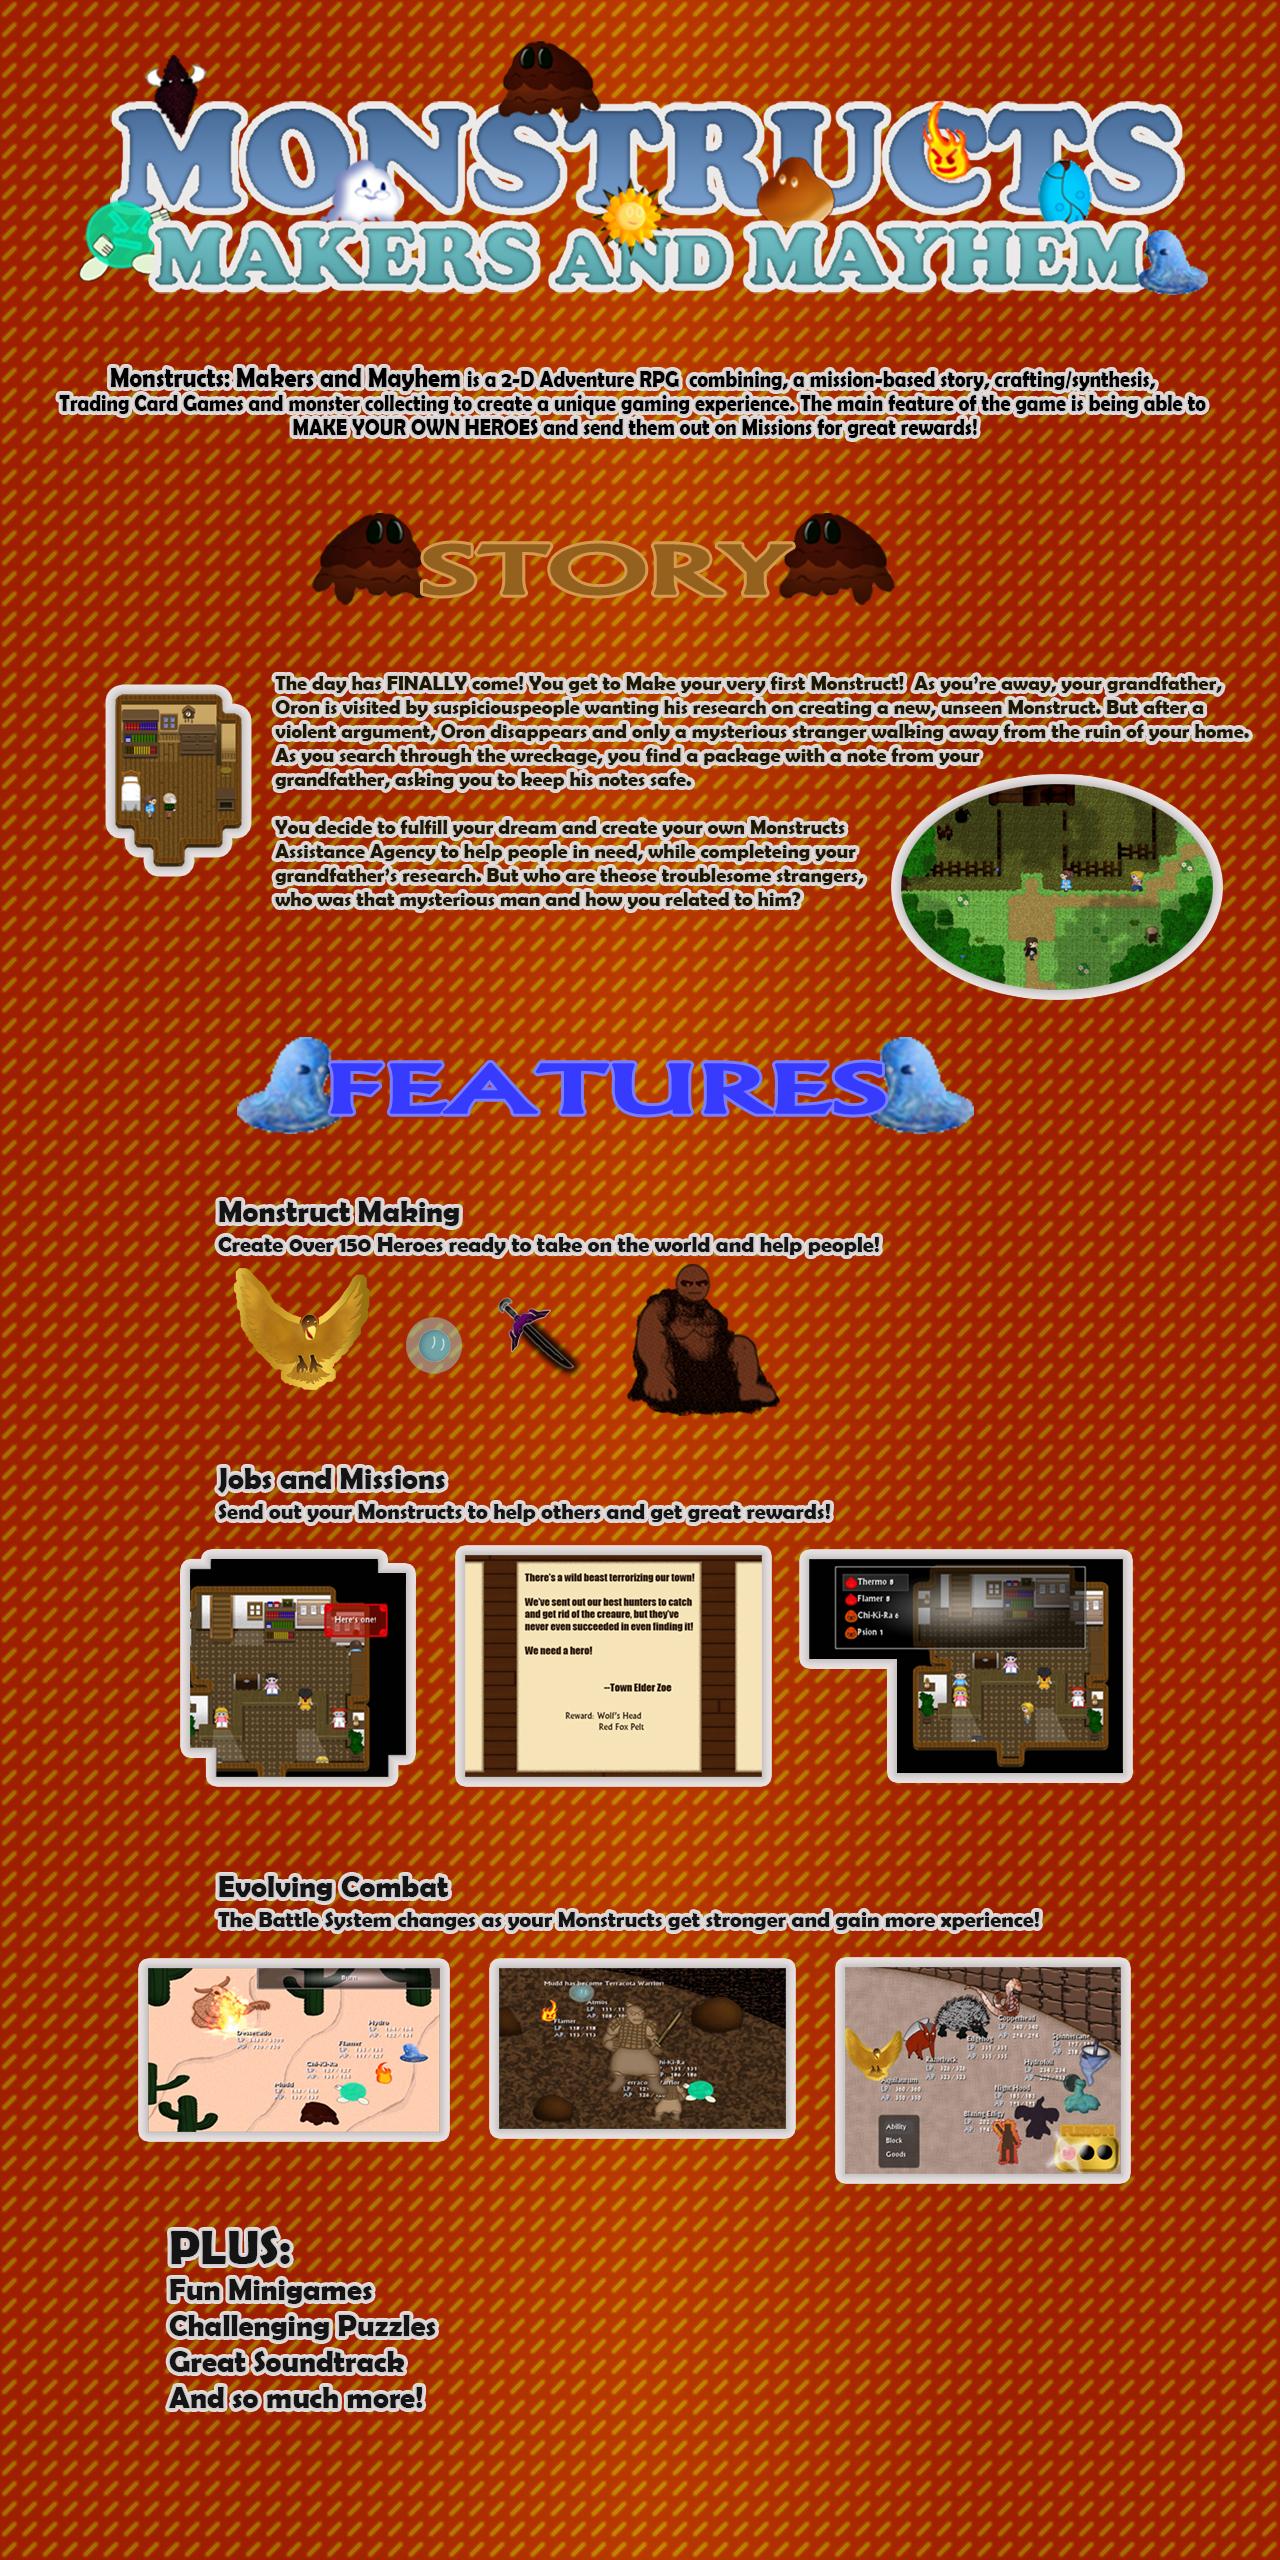 [Image: website-forum-template.jpg]